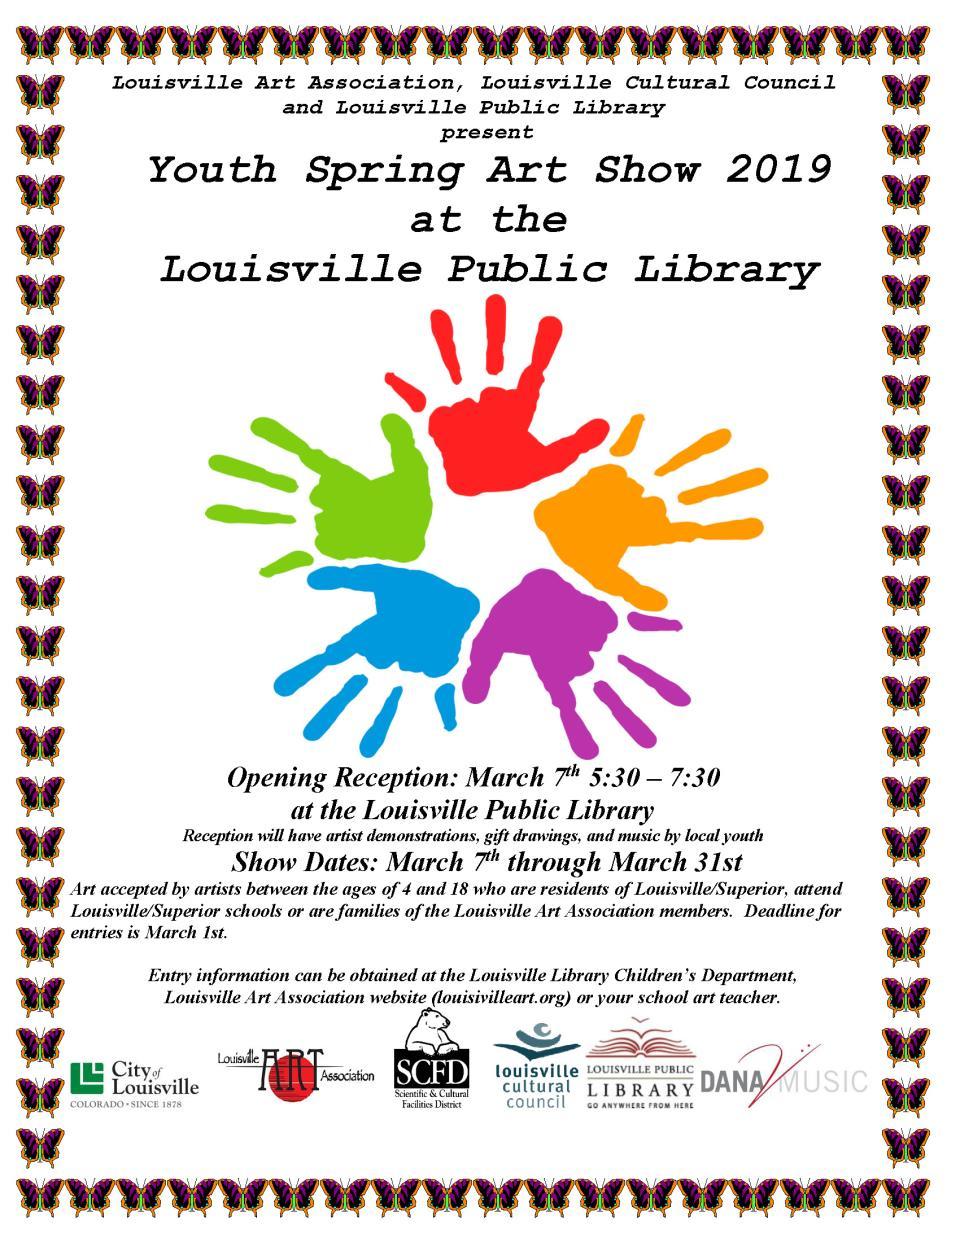 Louisville Events Calendar.Arts Events Calendar City Of Louisville Co